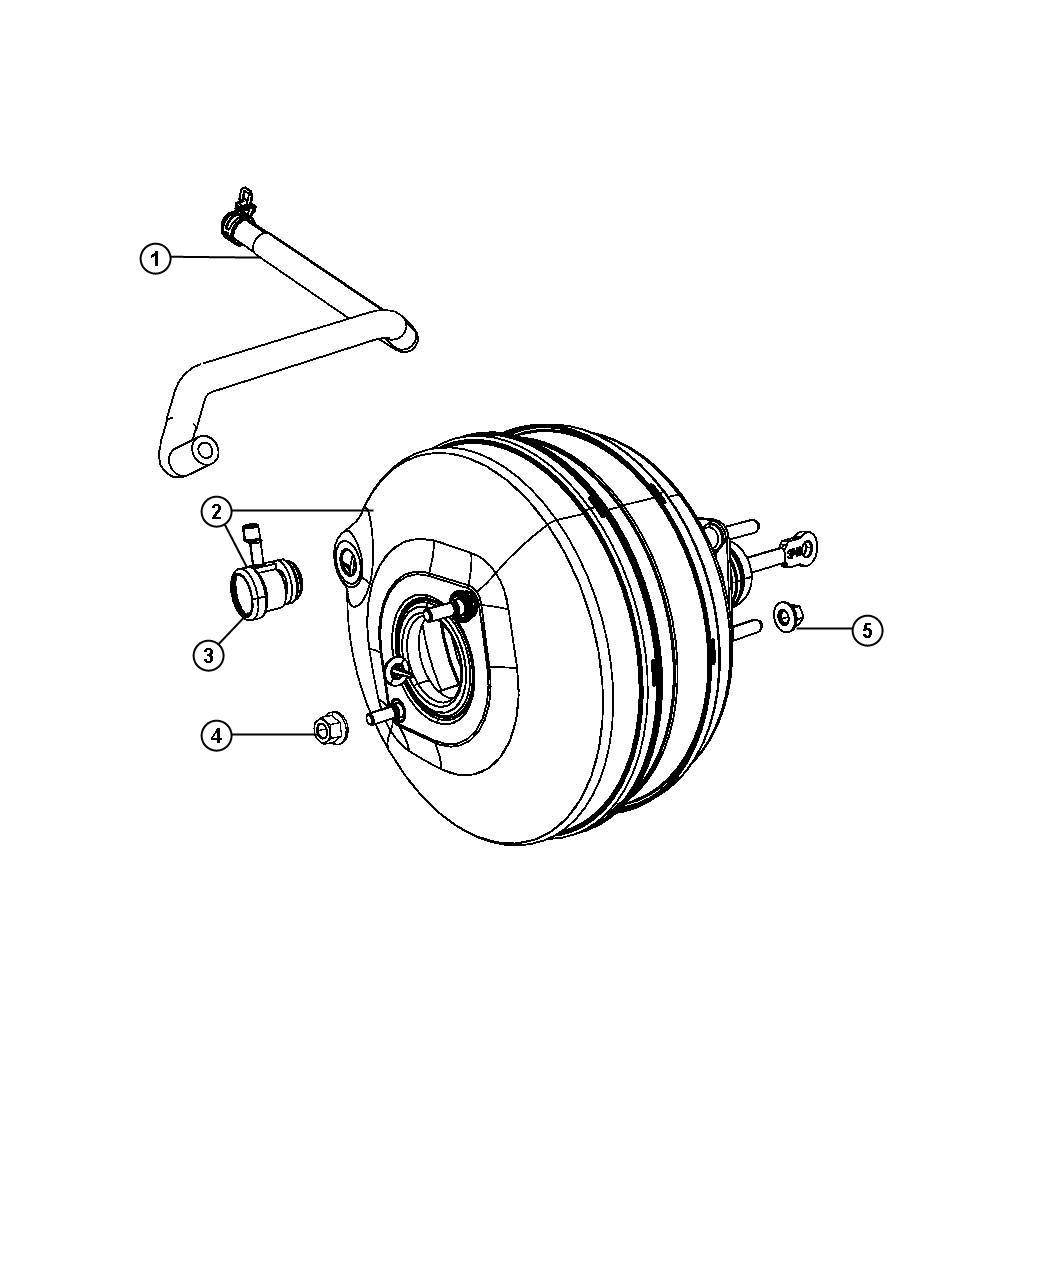 2012 dodge ram 1500 booster  power brake  vehicles built 9